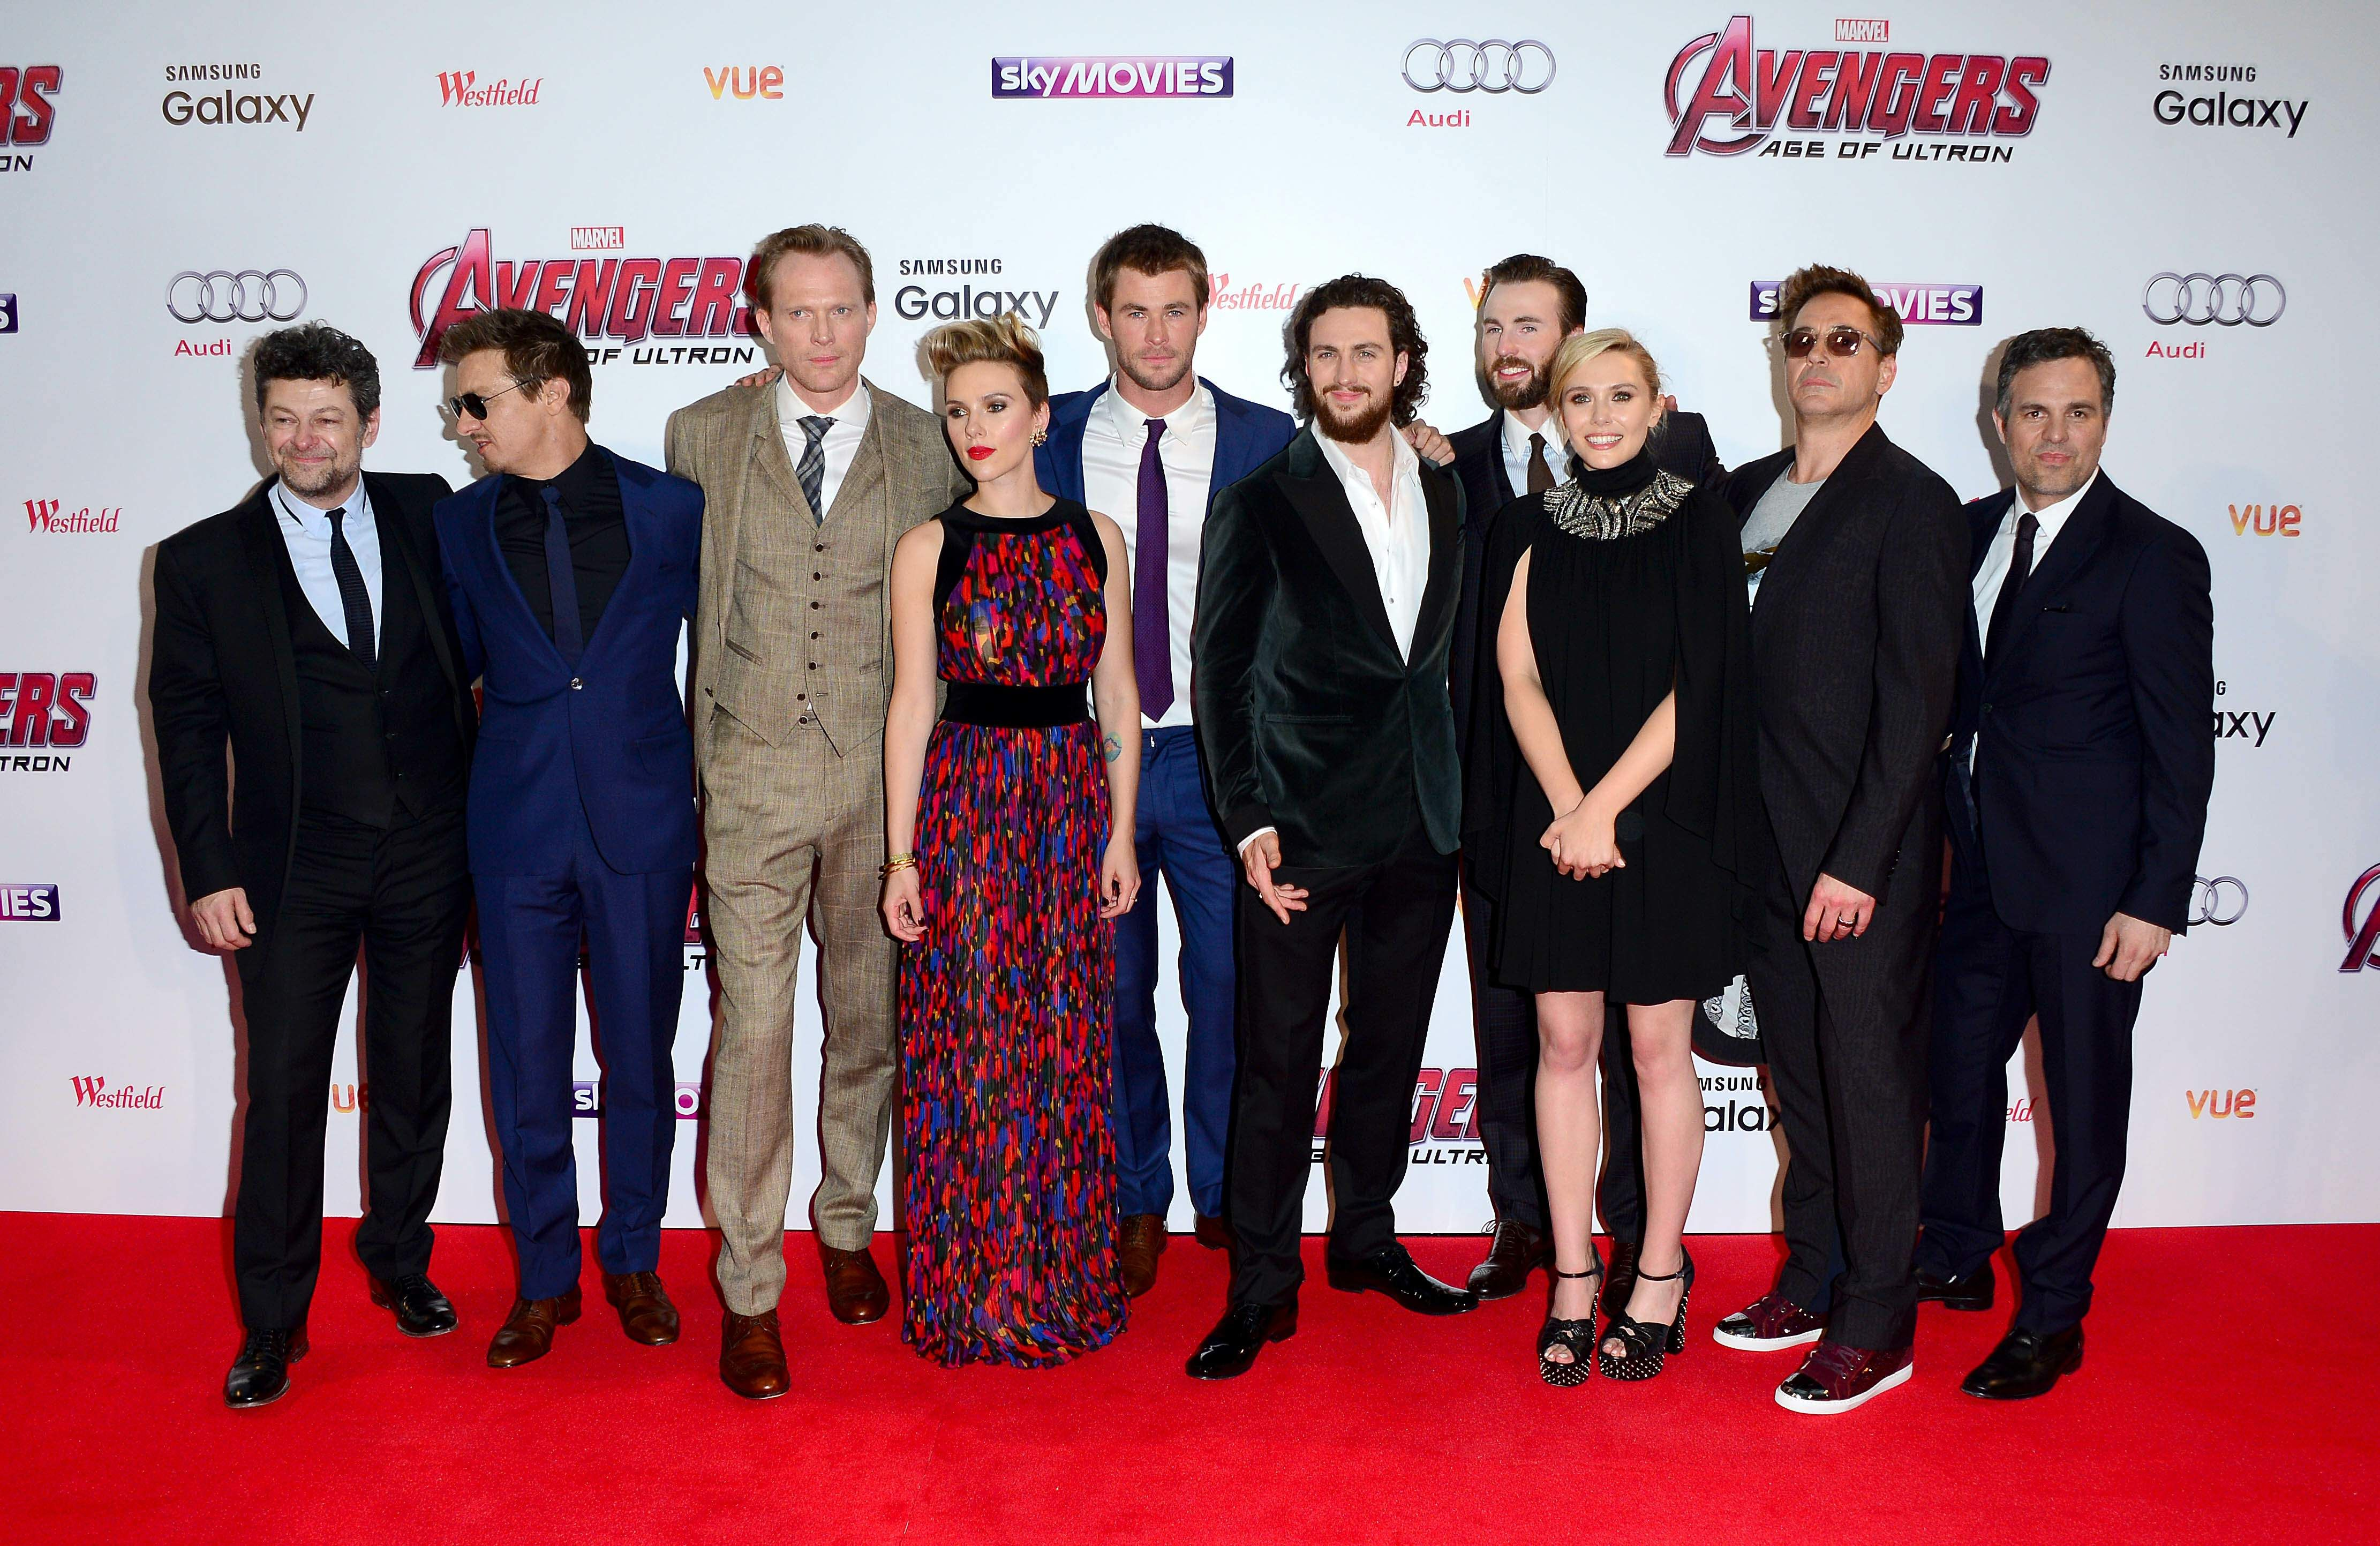 Fast Simple Image Host Avengers Chris Evans Avengers Cast